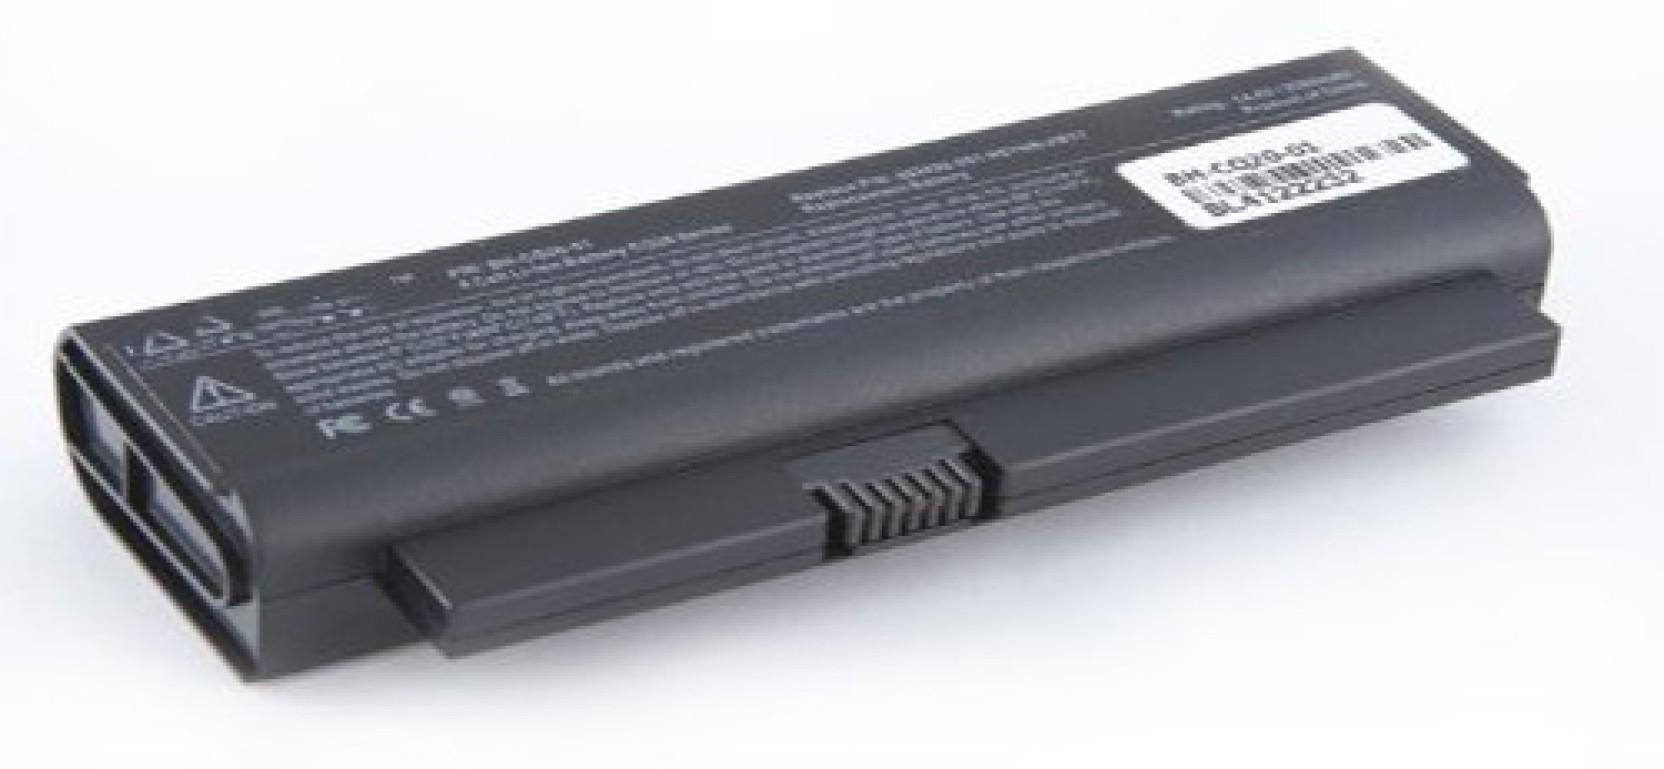 Nova Hp Cq20 Ob84 6 Cell Laptop Battery Charger Compaq Presario Share